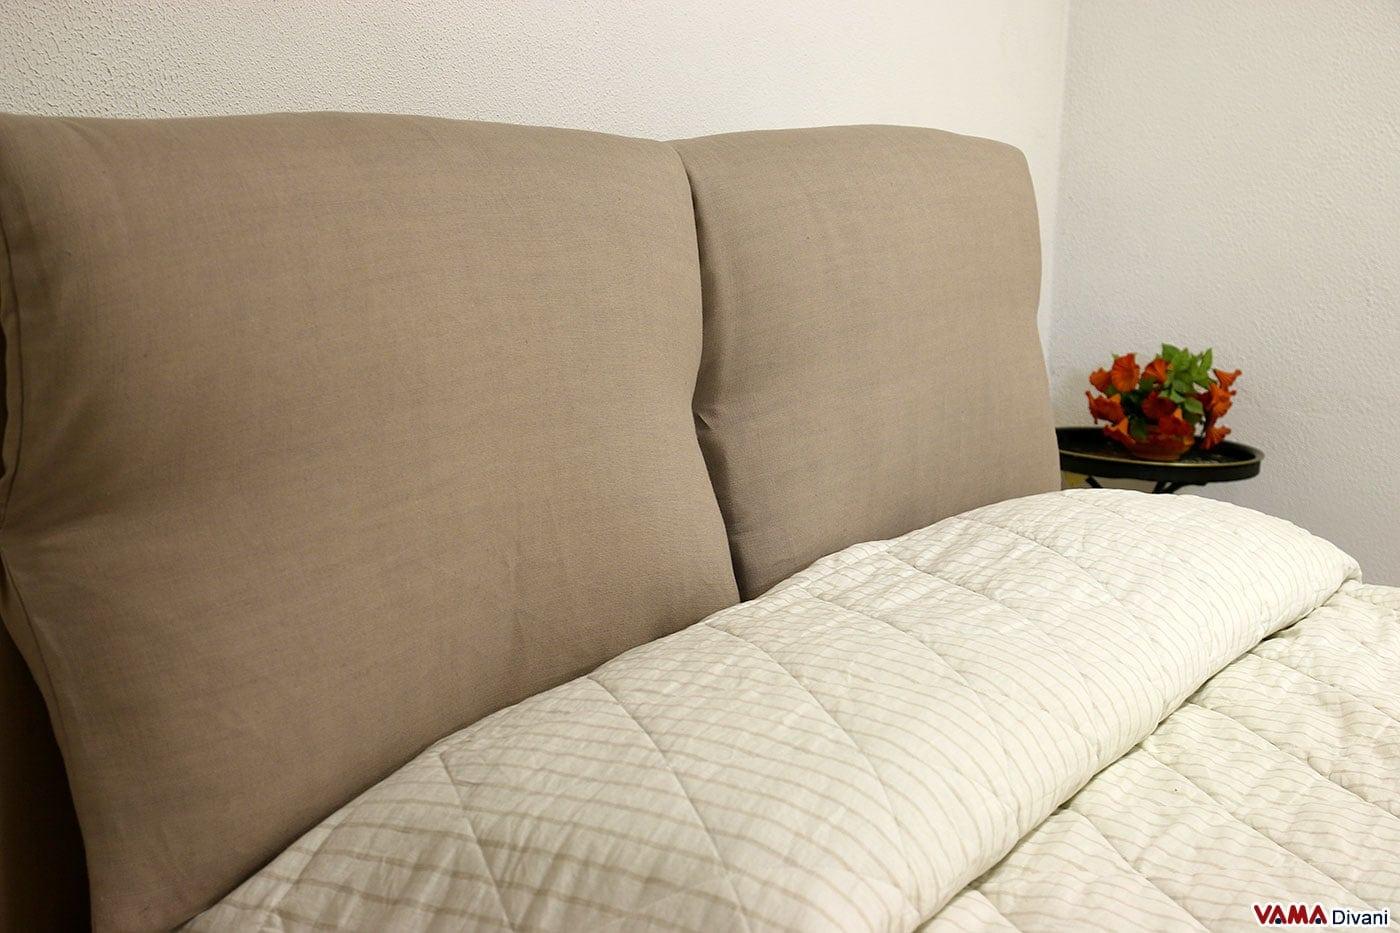 Cuscini testata letto cuscini testata letto dalani cuscini per testata letto - Testata letto cuscini ...